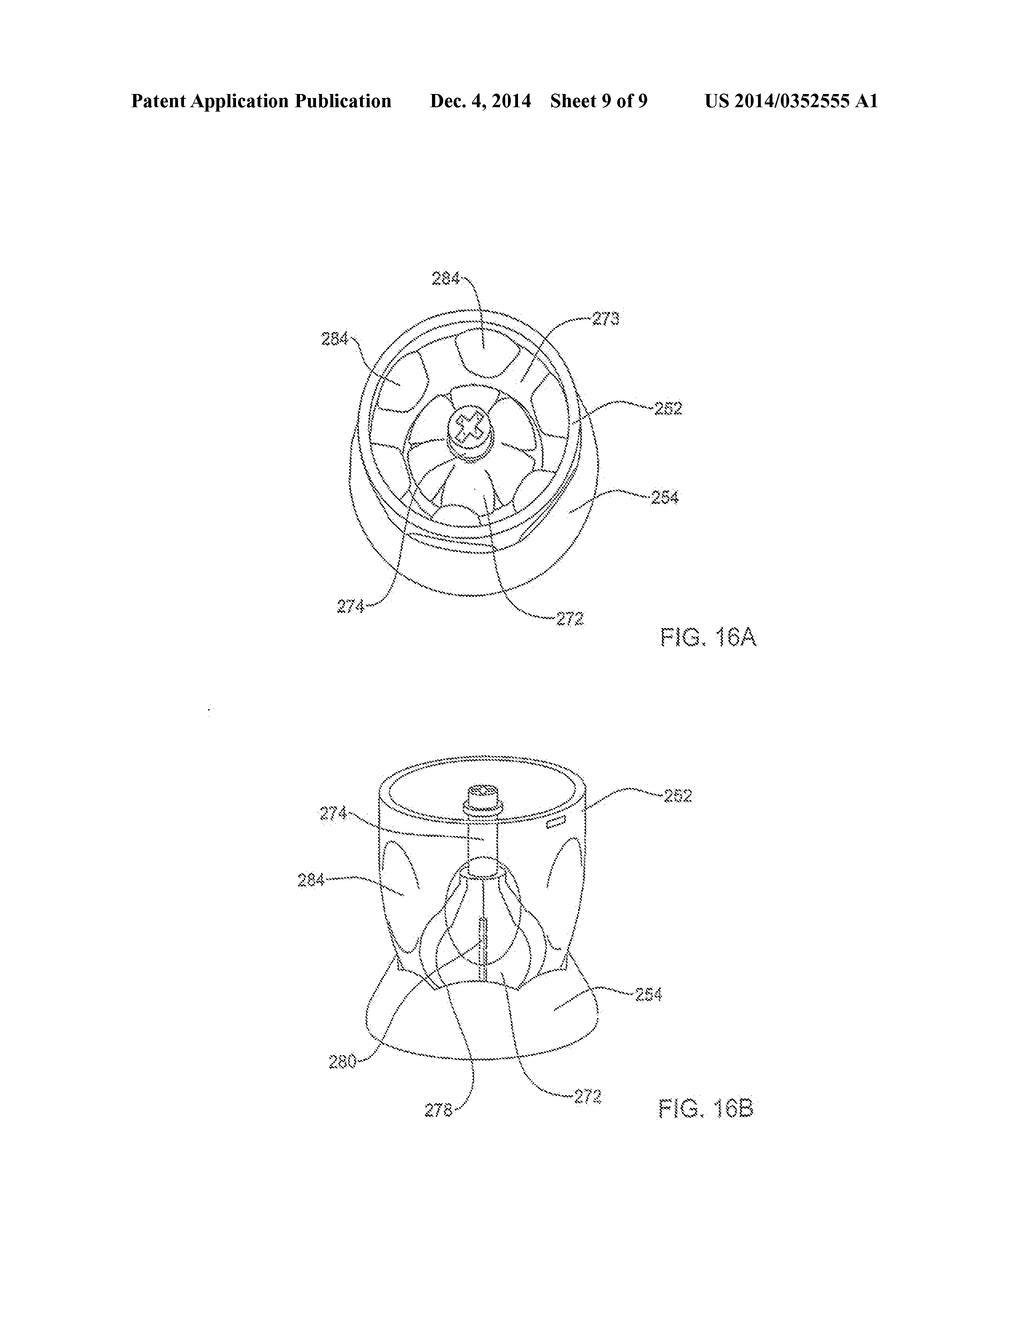 20140352555_10 garlic peeler diagram, schematic, and image 10